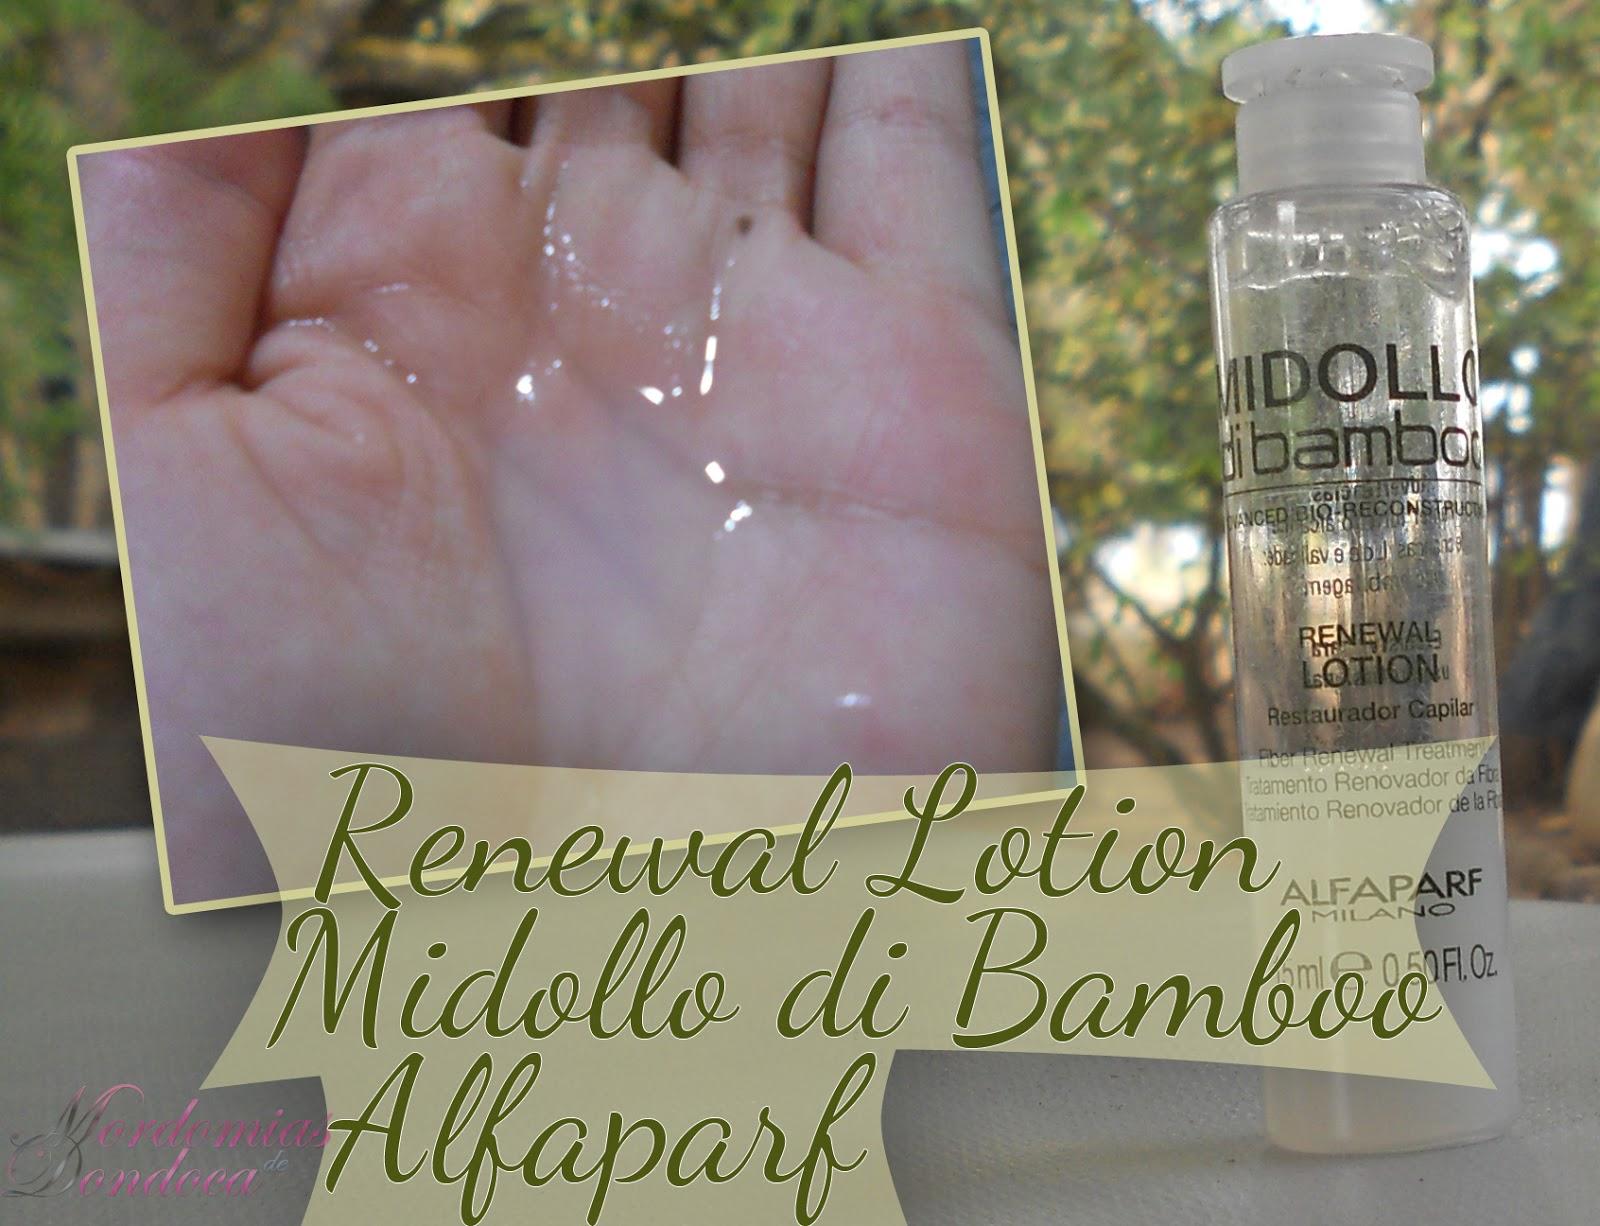 Renewal Lotion Midollo di Bamboo Alfaparf